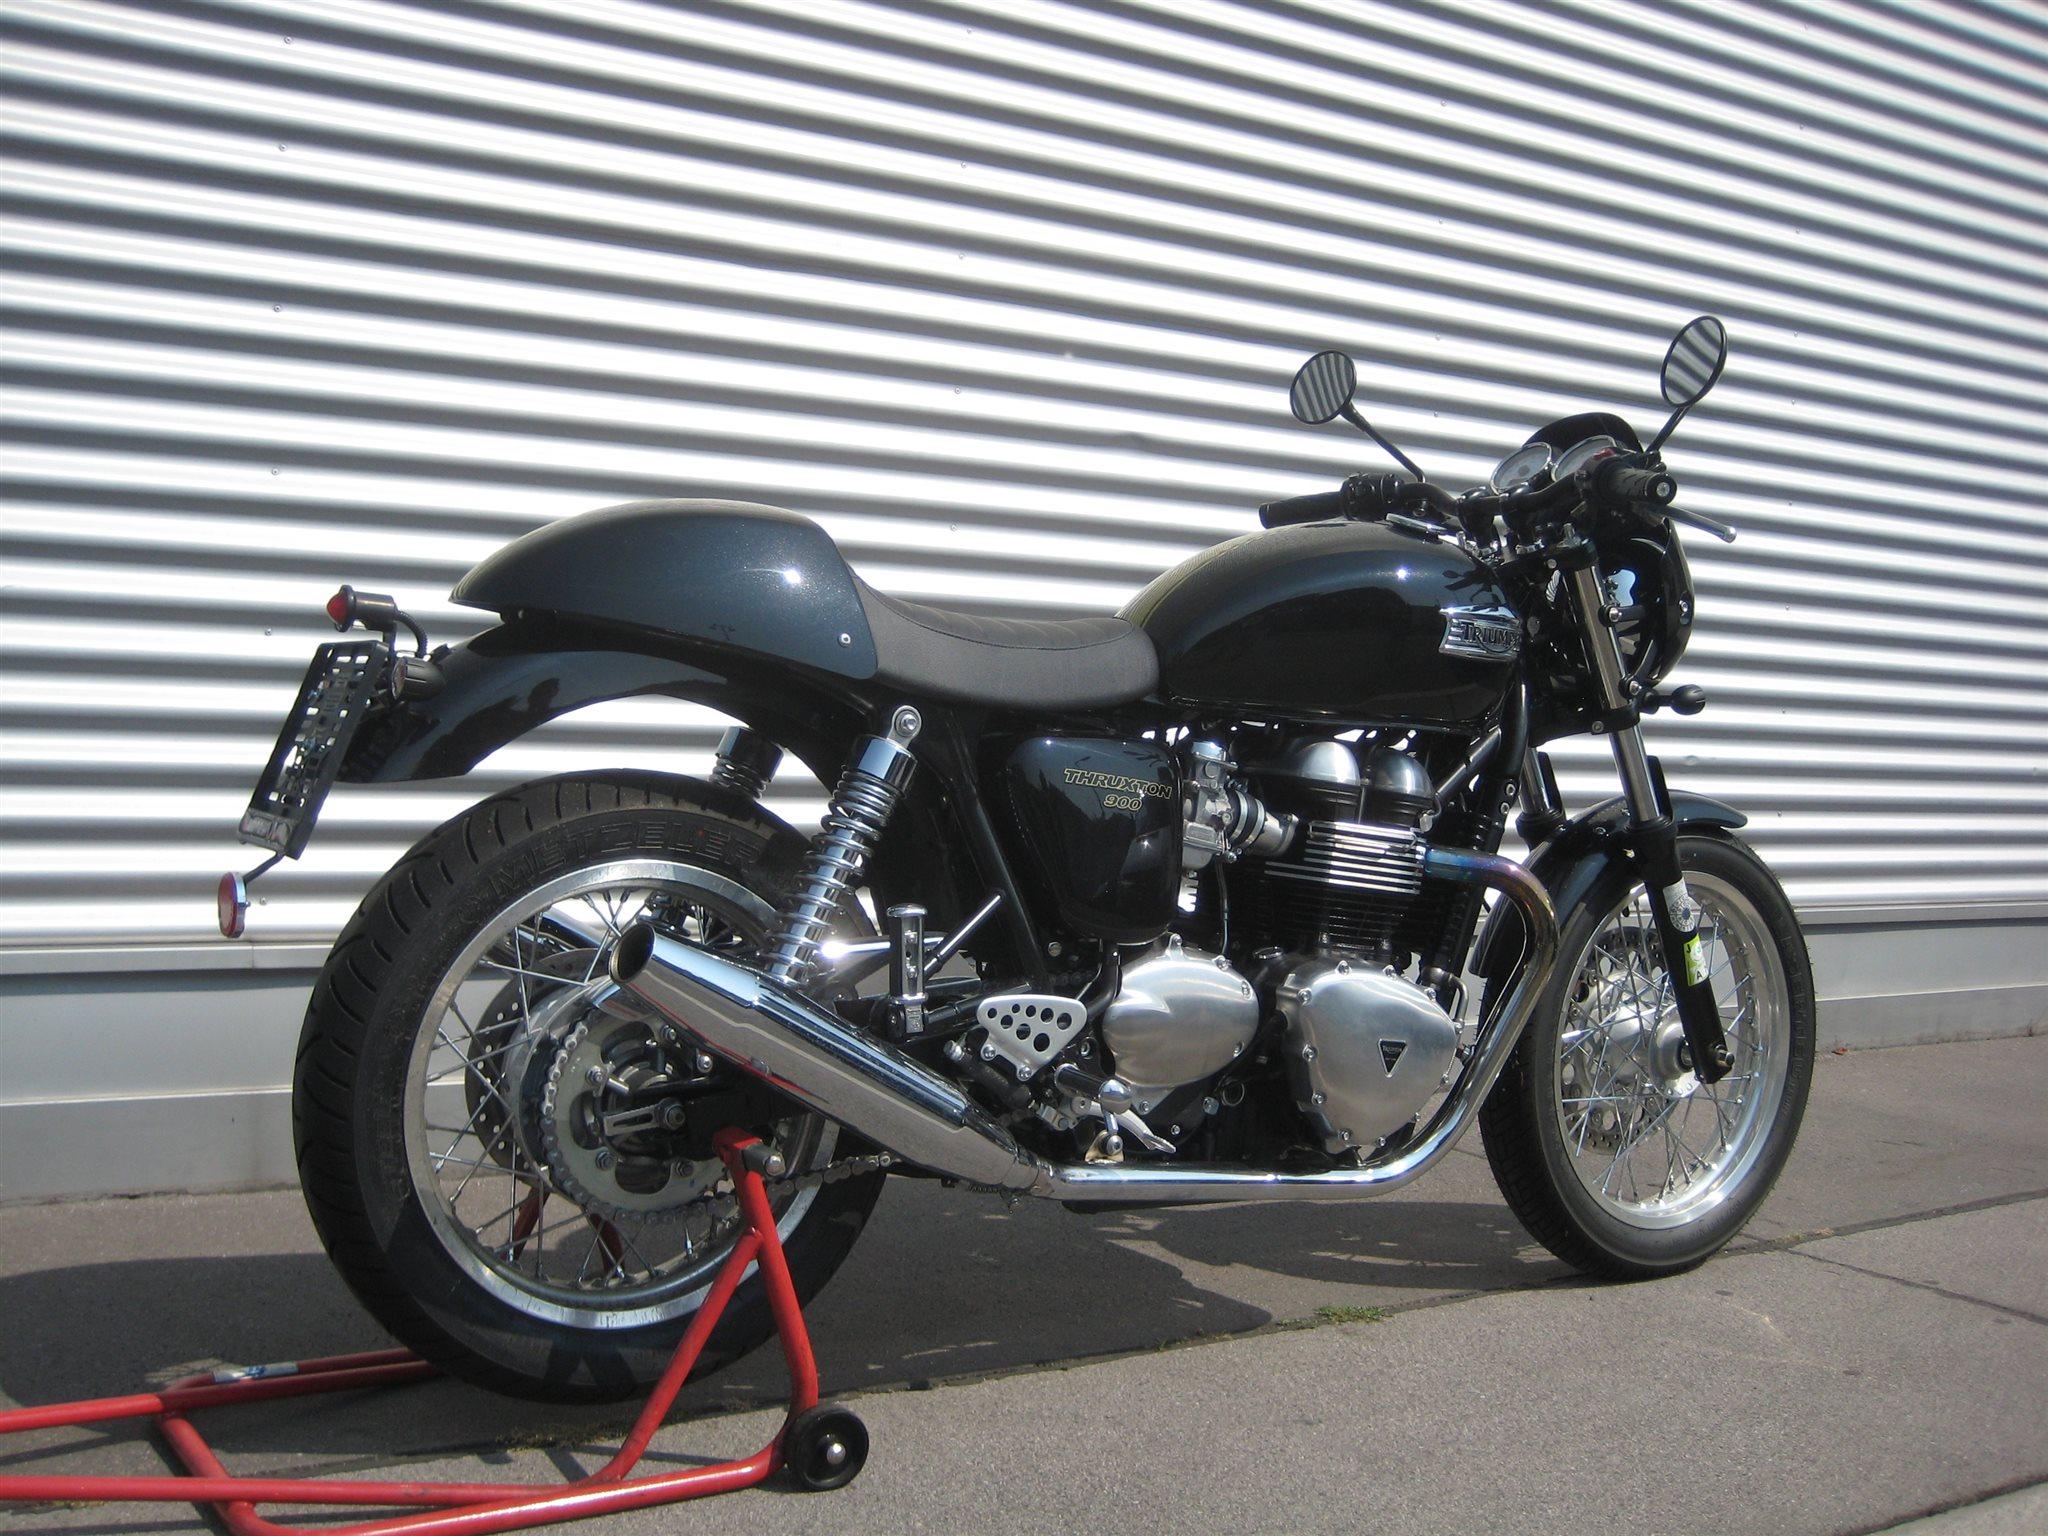 umgebautes motorrad triumph thruxton von il moto gesmbh. Black Bedroom Furniture Sets. Home Design Ideas